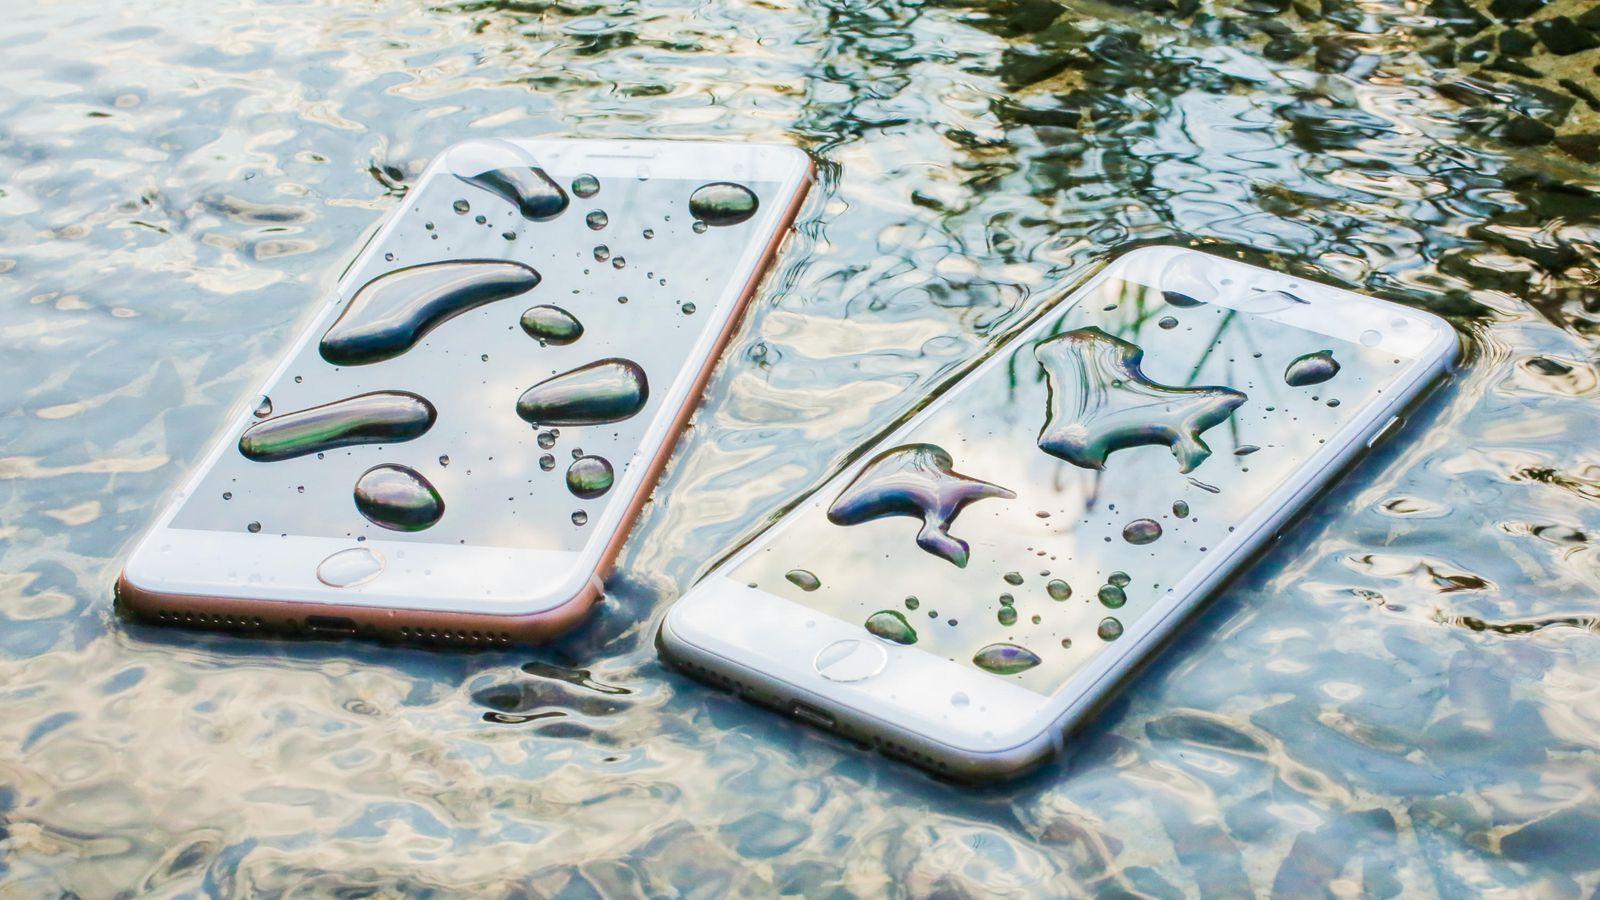 Best Waterproof Android Phones in 2018